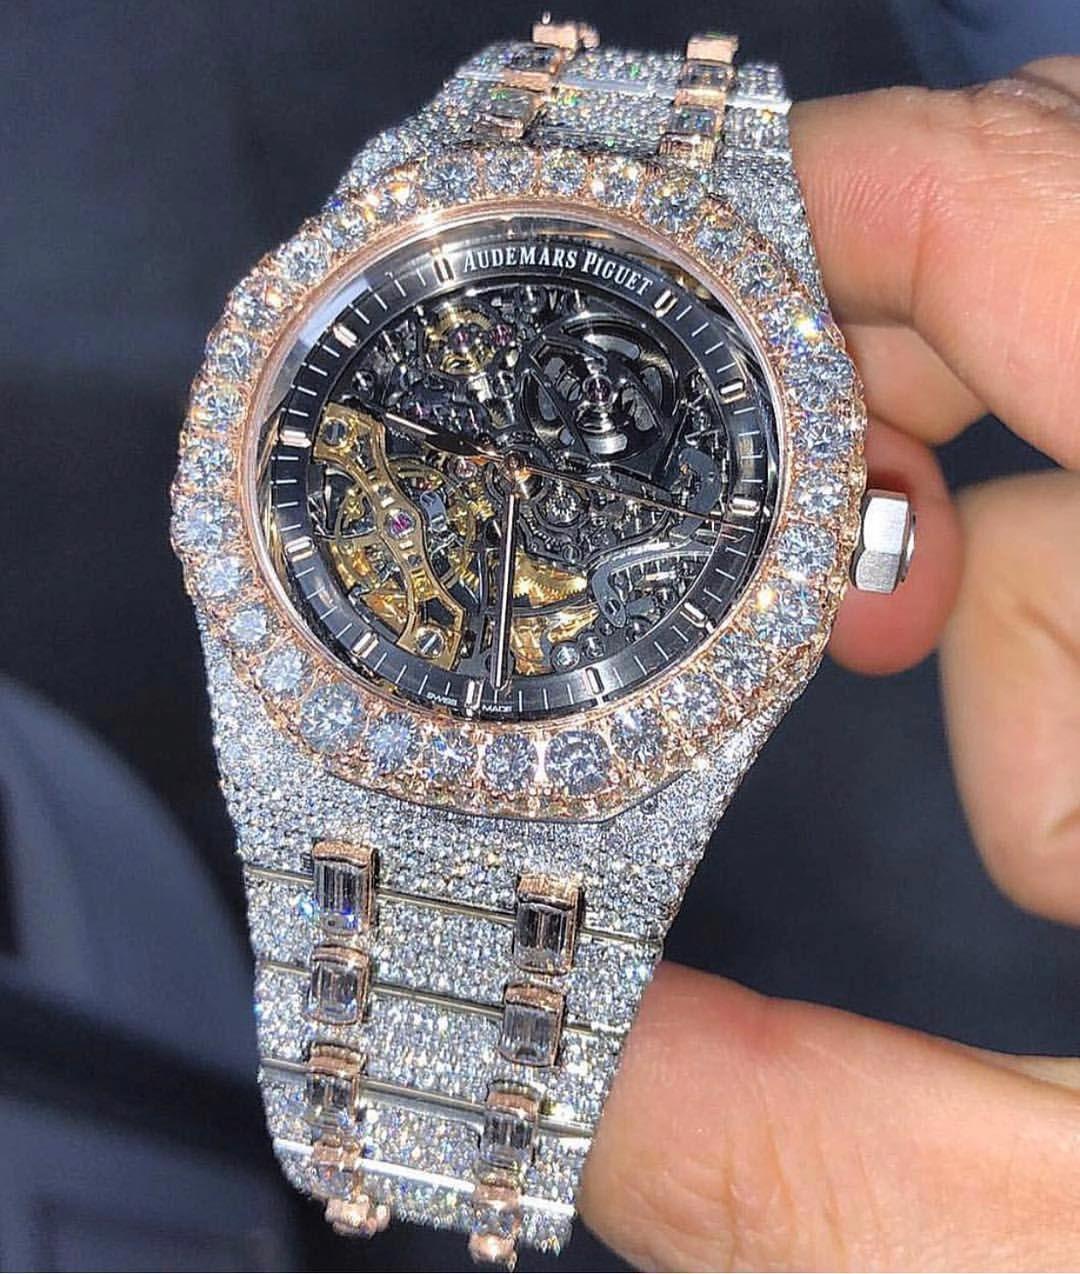 Bustdown Ap Skelly Royal Oak Luxury Watches For Men